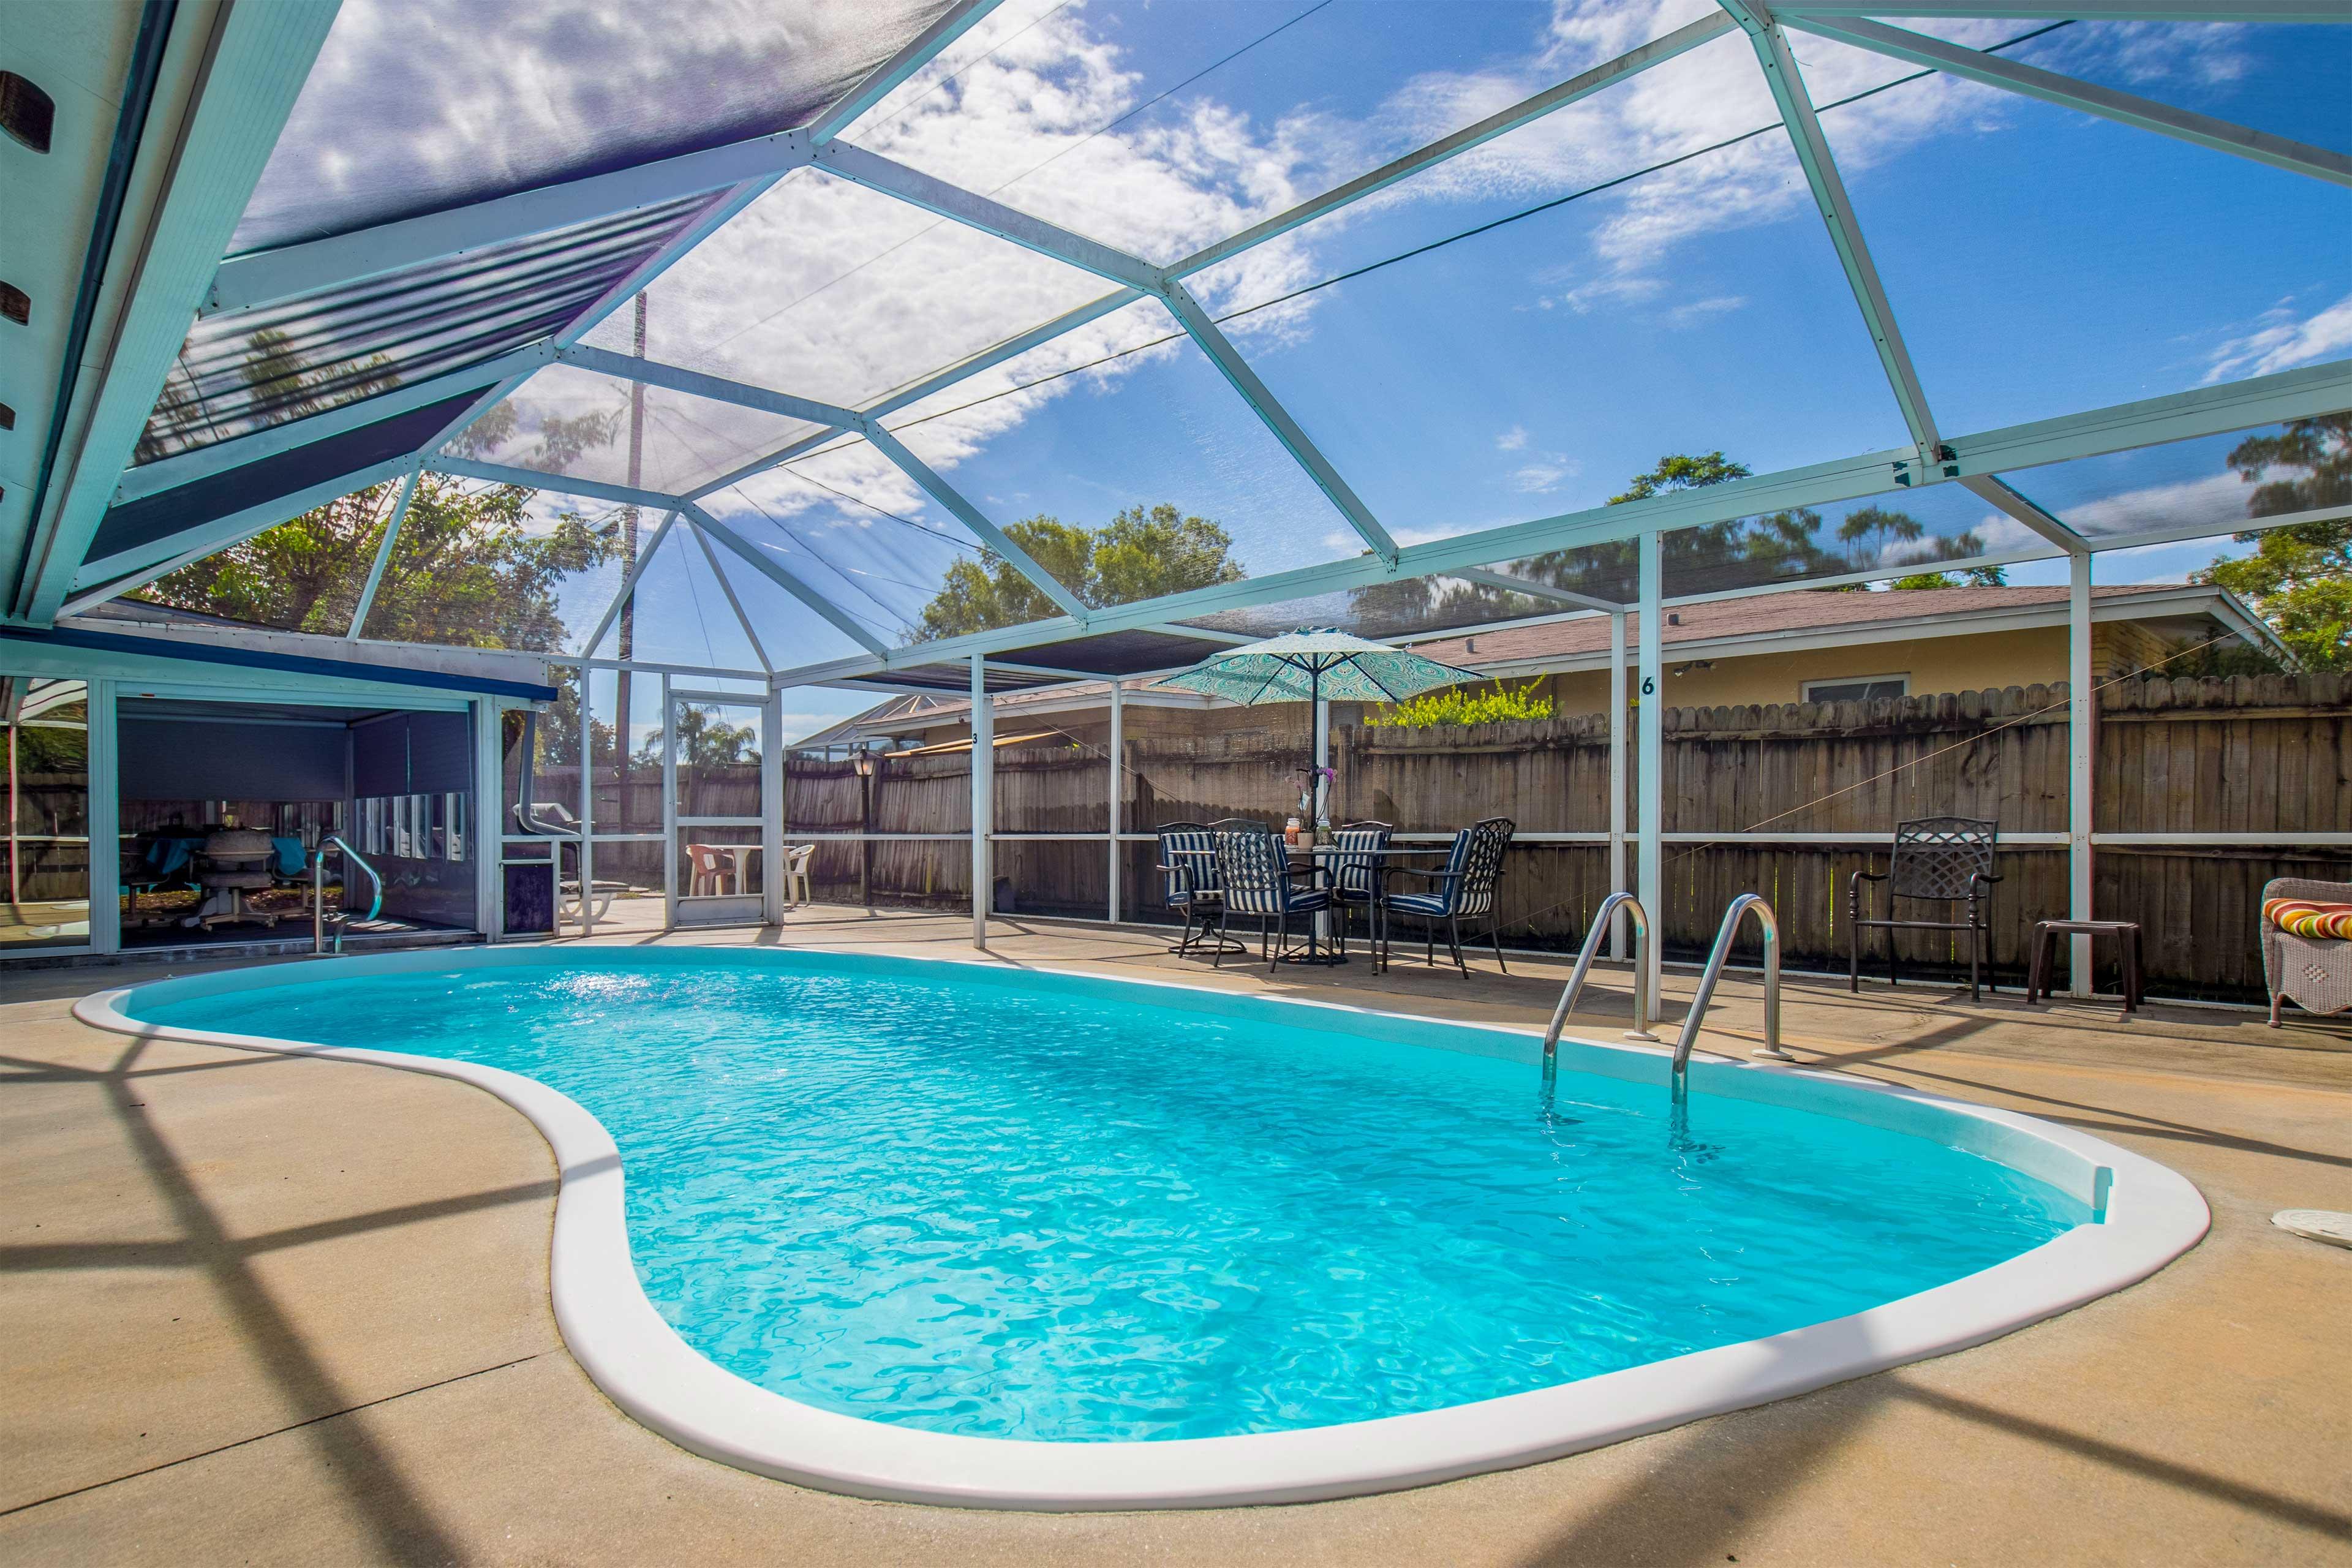 Bradenton Vacation Rental Home   2BR   2BA   1,750 Sq Ft